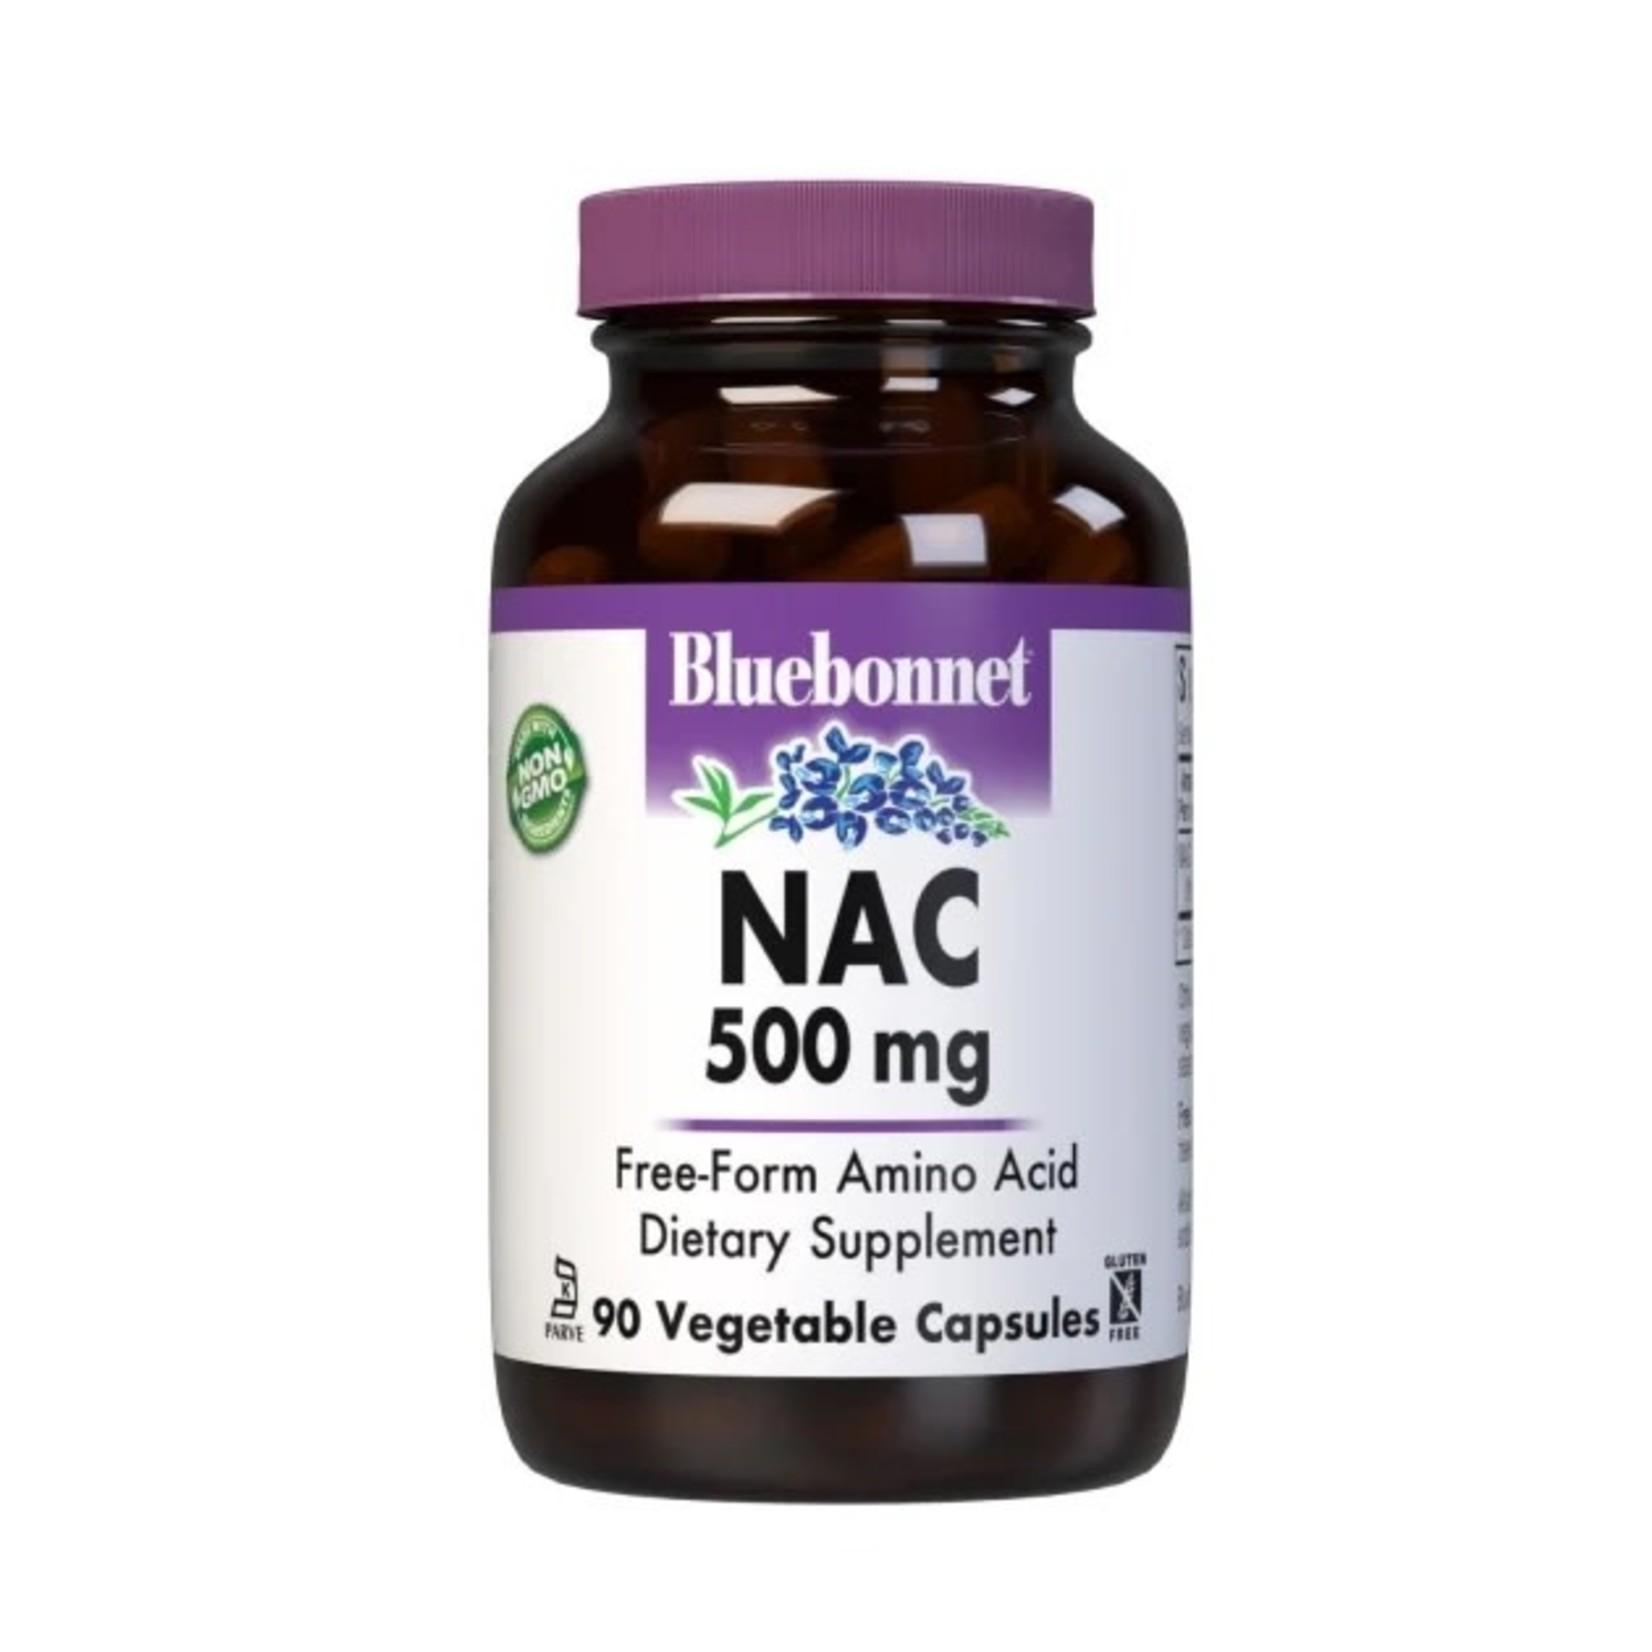 BlueBonnet Bluebonnet NAC 500mg 90 Vegetable Capsules